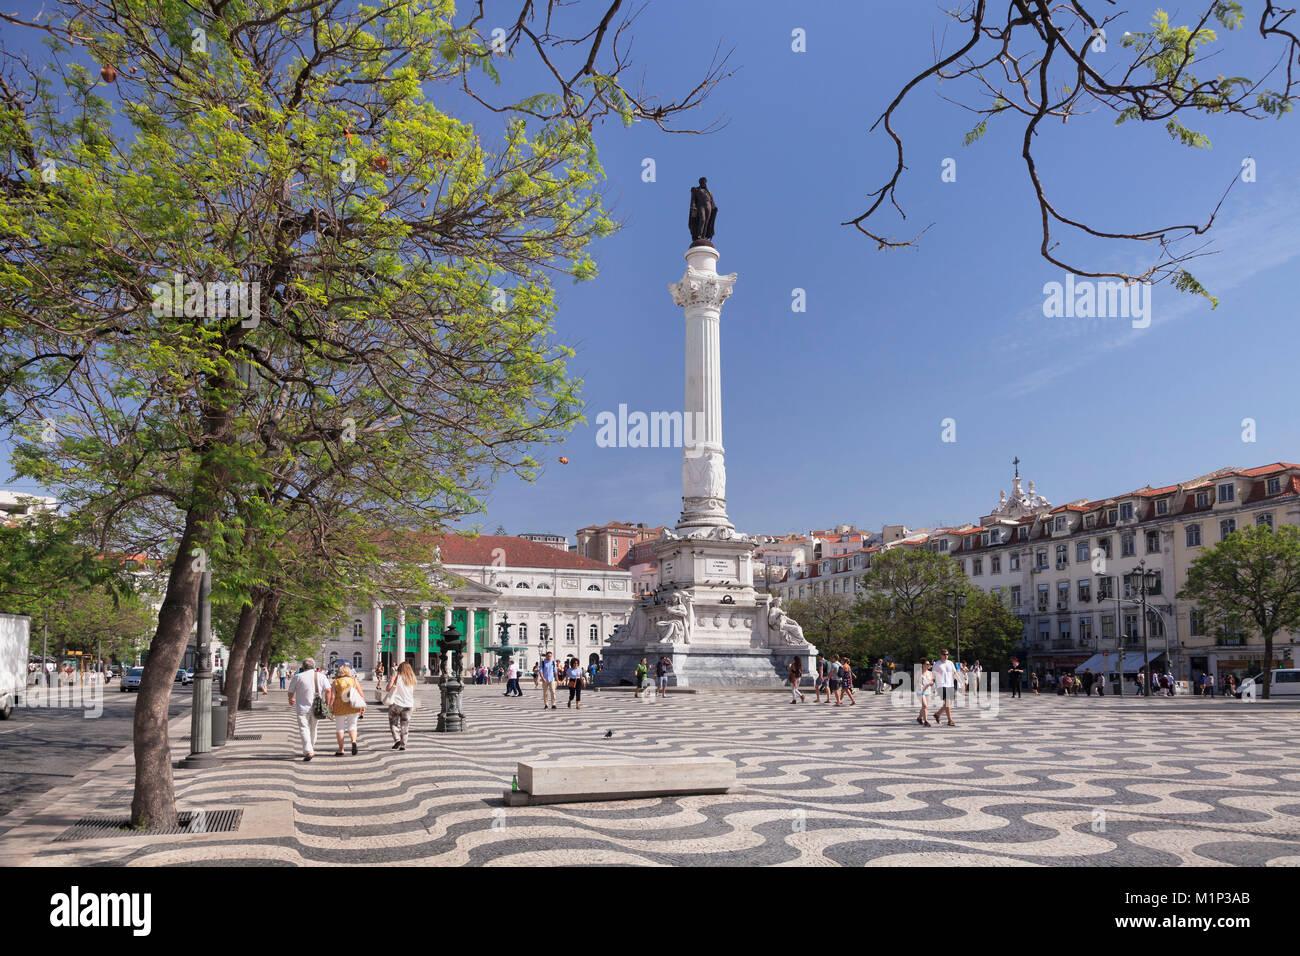 Rossio, Praca Dom Pedro IV, National Theatre Dona Maria II, Baixa, Lisbon, Portugal, Europe Stock Photo